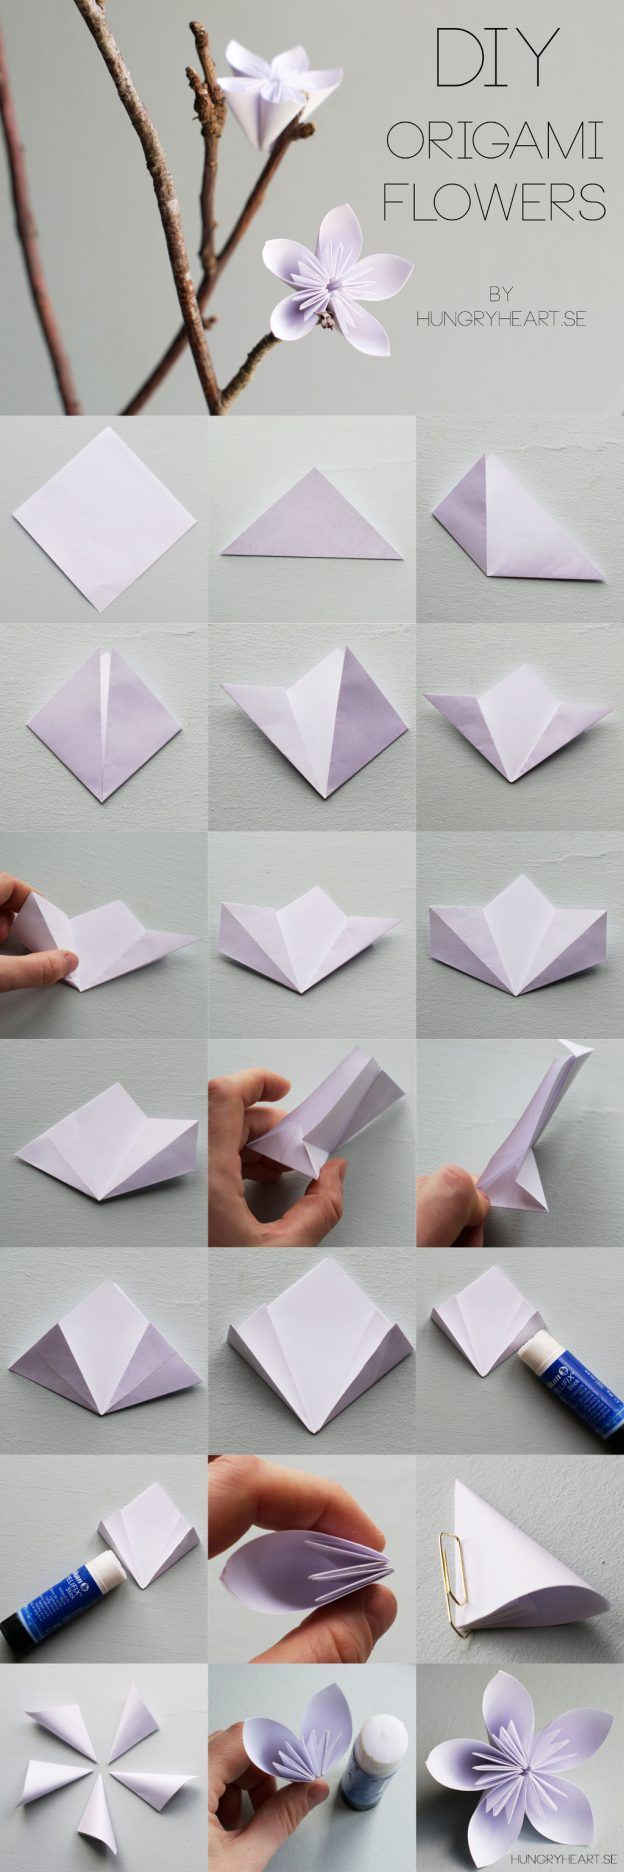 Diy Origami Flower Step By Step Tutorial Hungryheart Origami